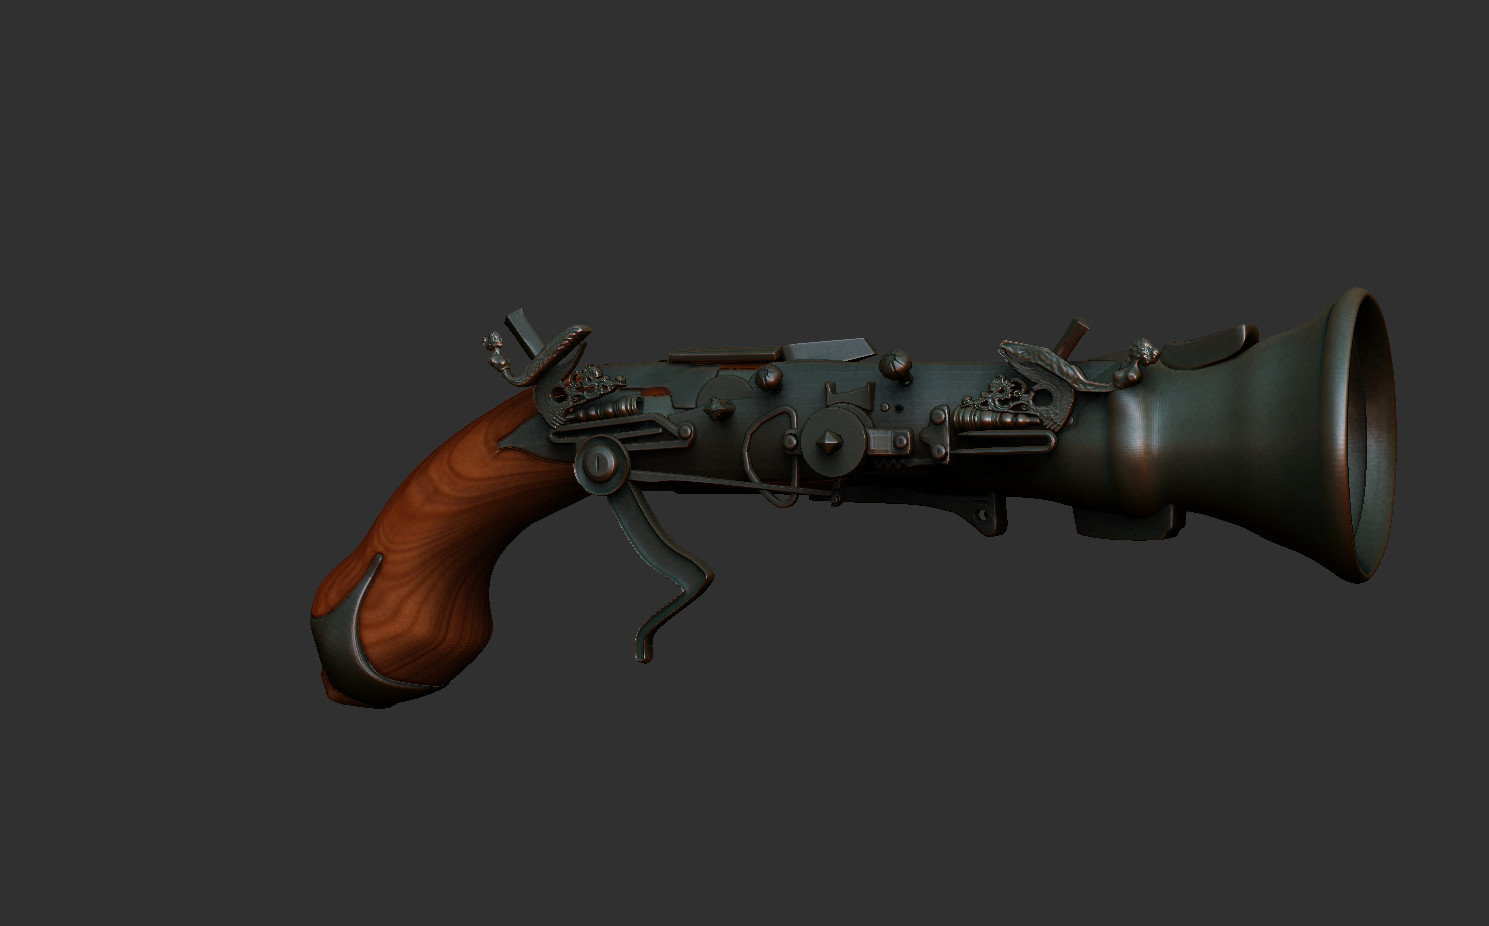 Fabricio rezende gun z brush render